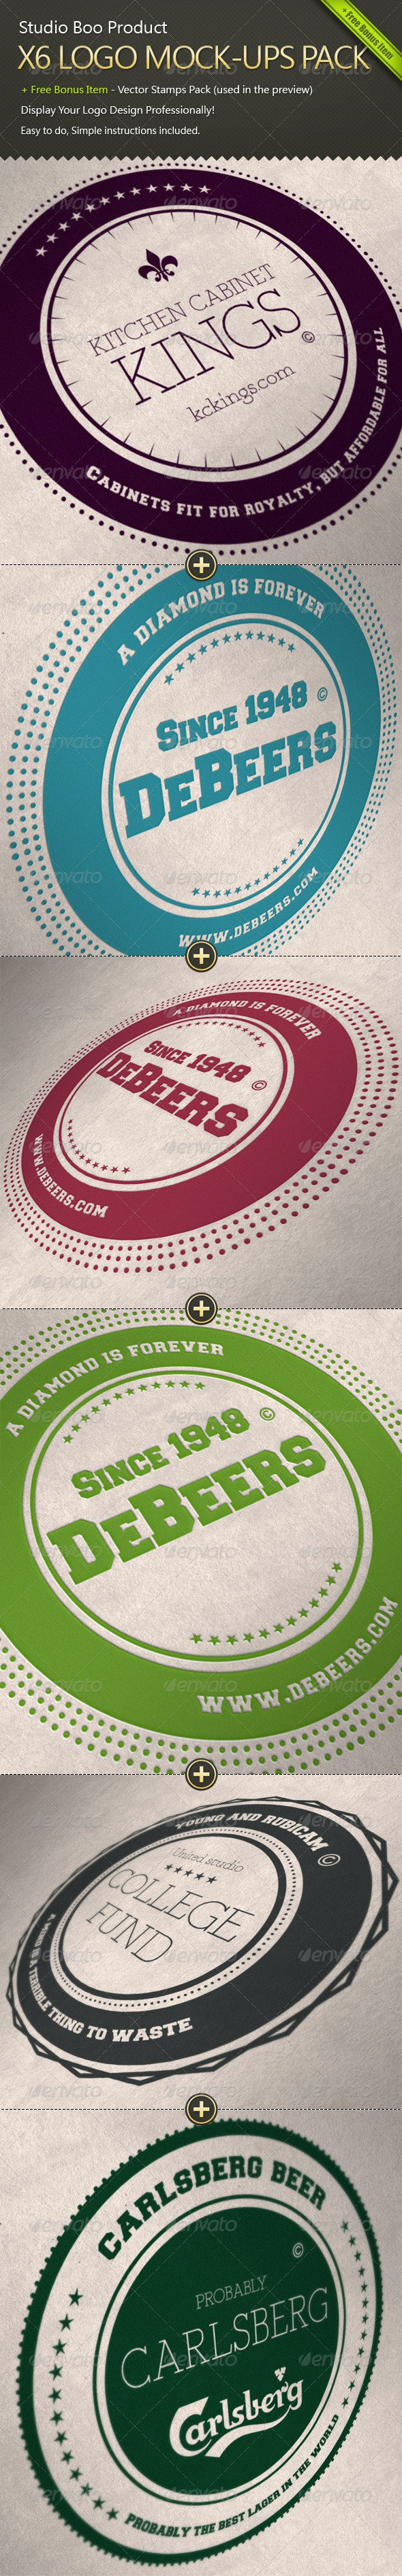 X6 Logo Mock-ups Pack + Free Bonus Item - Logo Product Mock-Ups